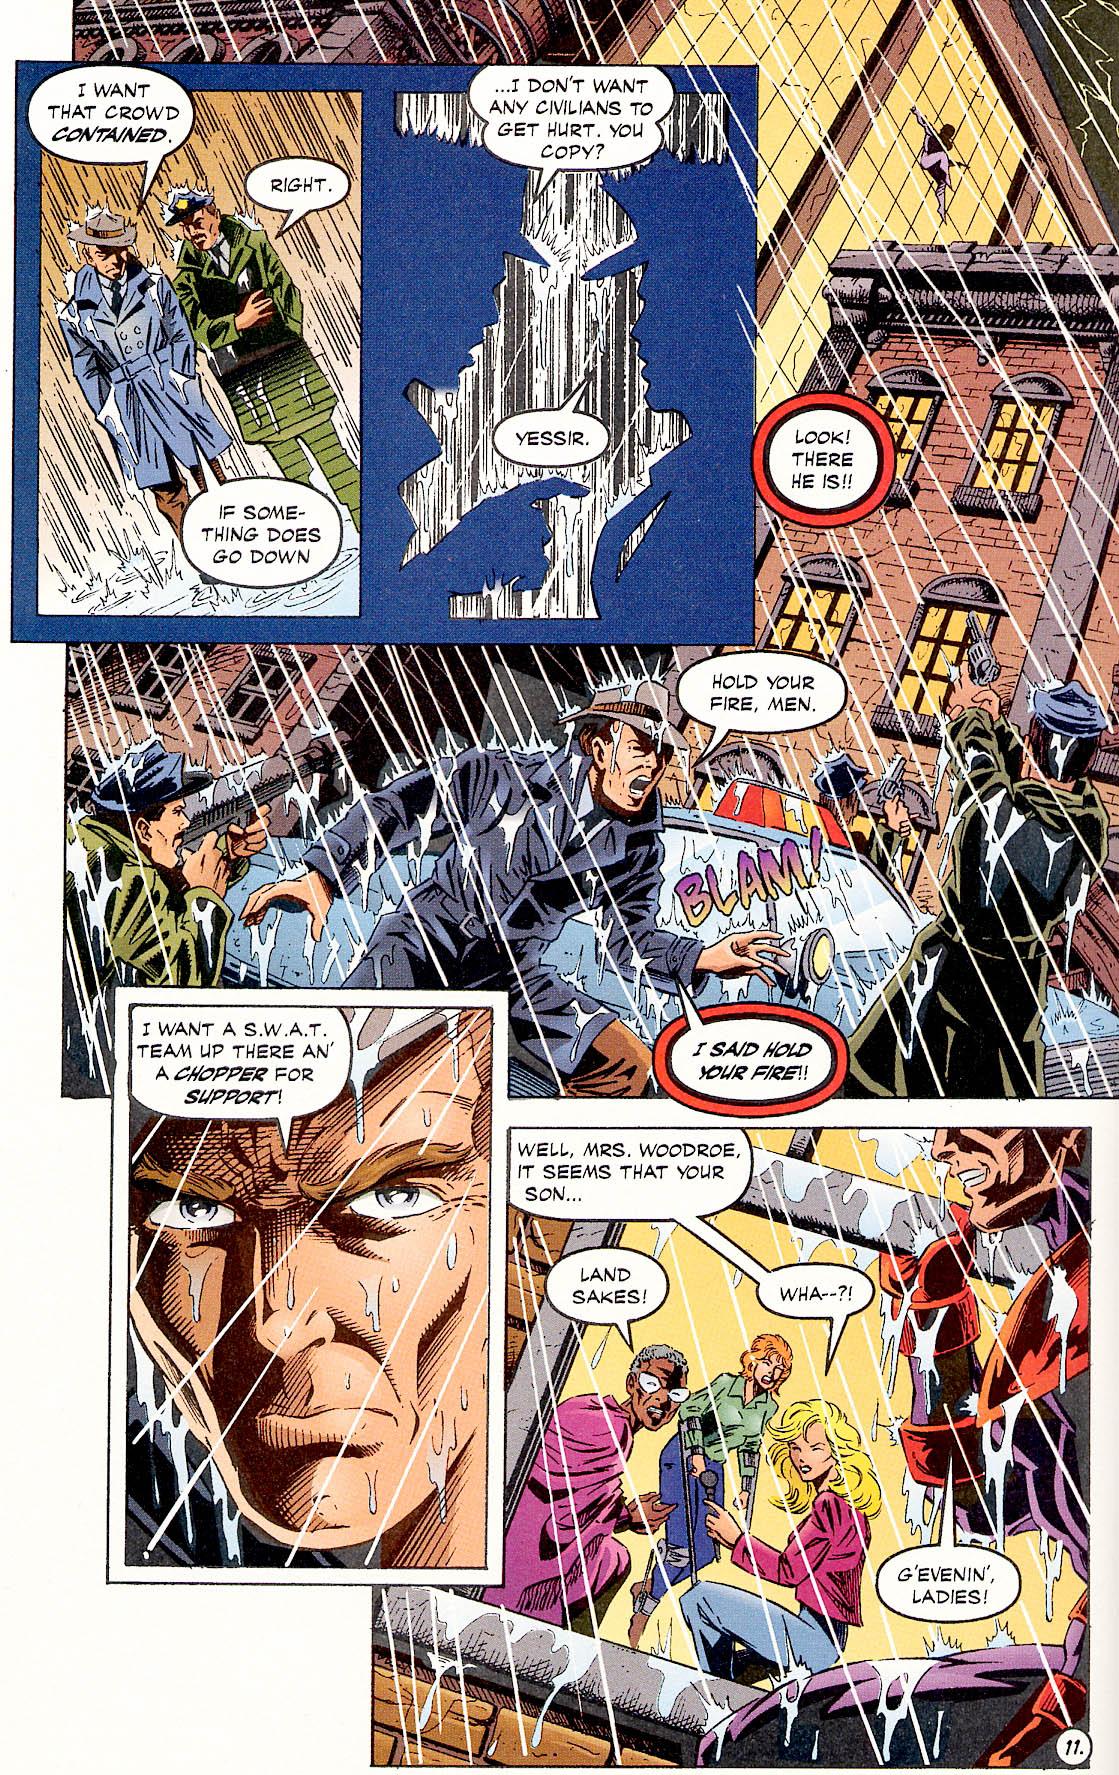 Read online ShadowHawk comic -  Issue #18 - 13